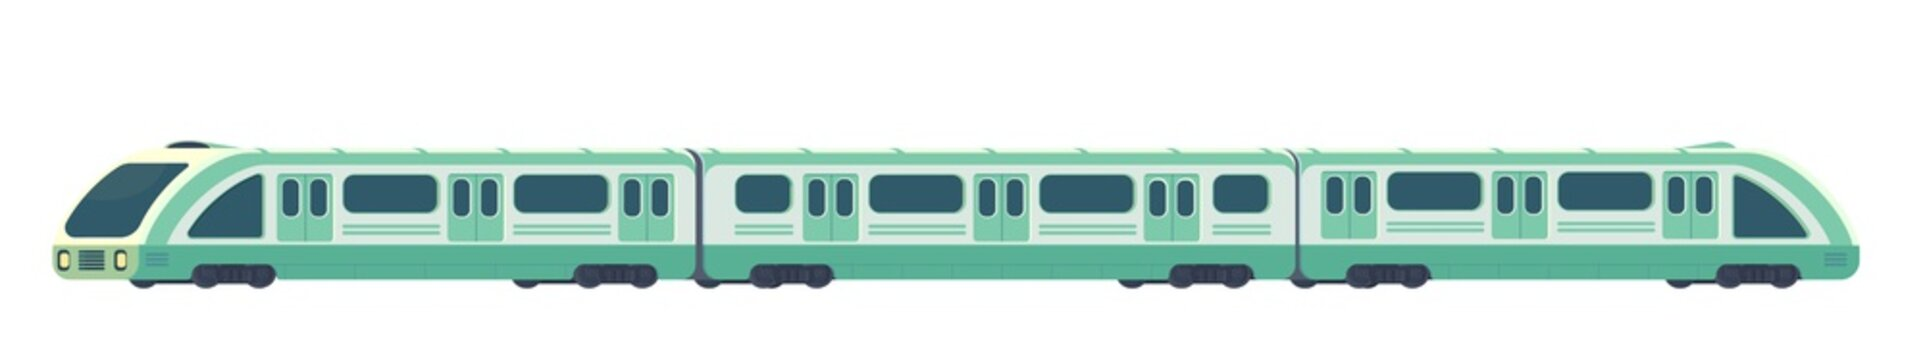 Passanger modern electric high-speed train. Railway subway or metro transport. Underground train Vector illustration flat style.